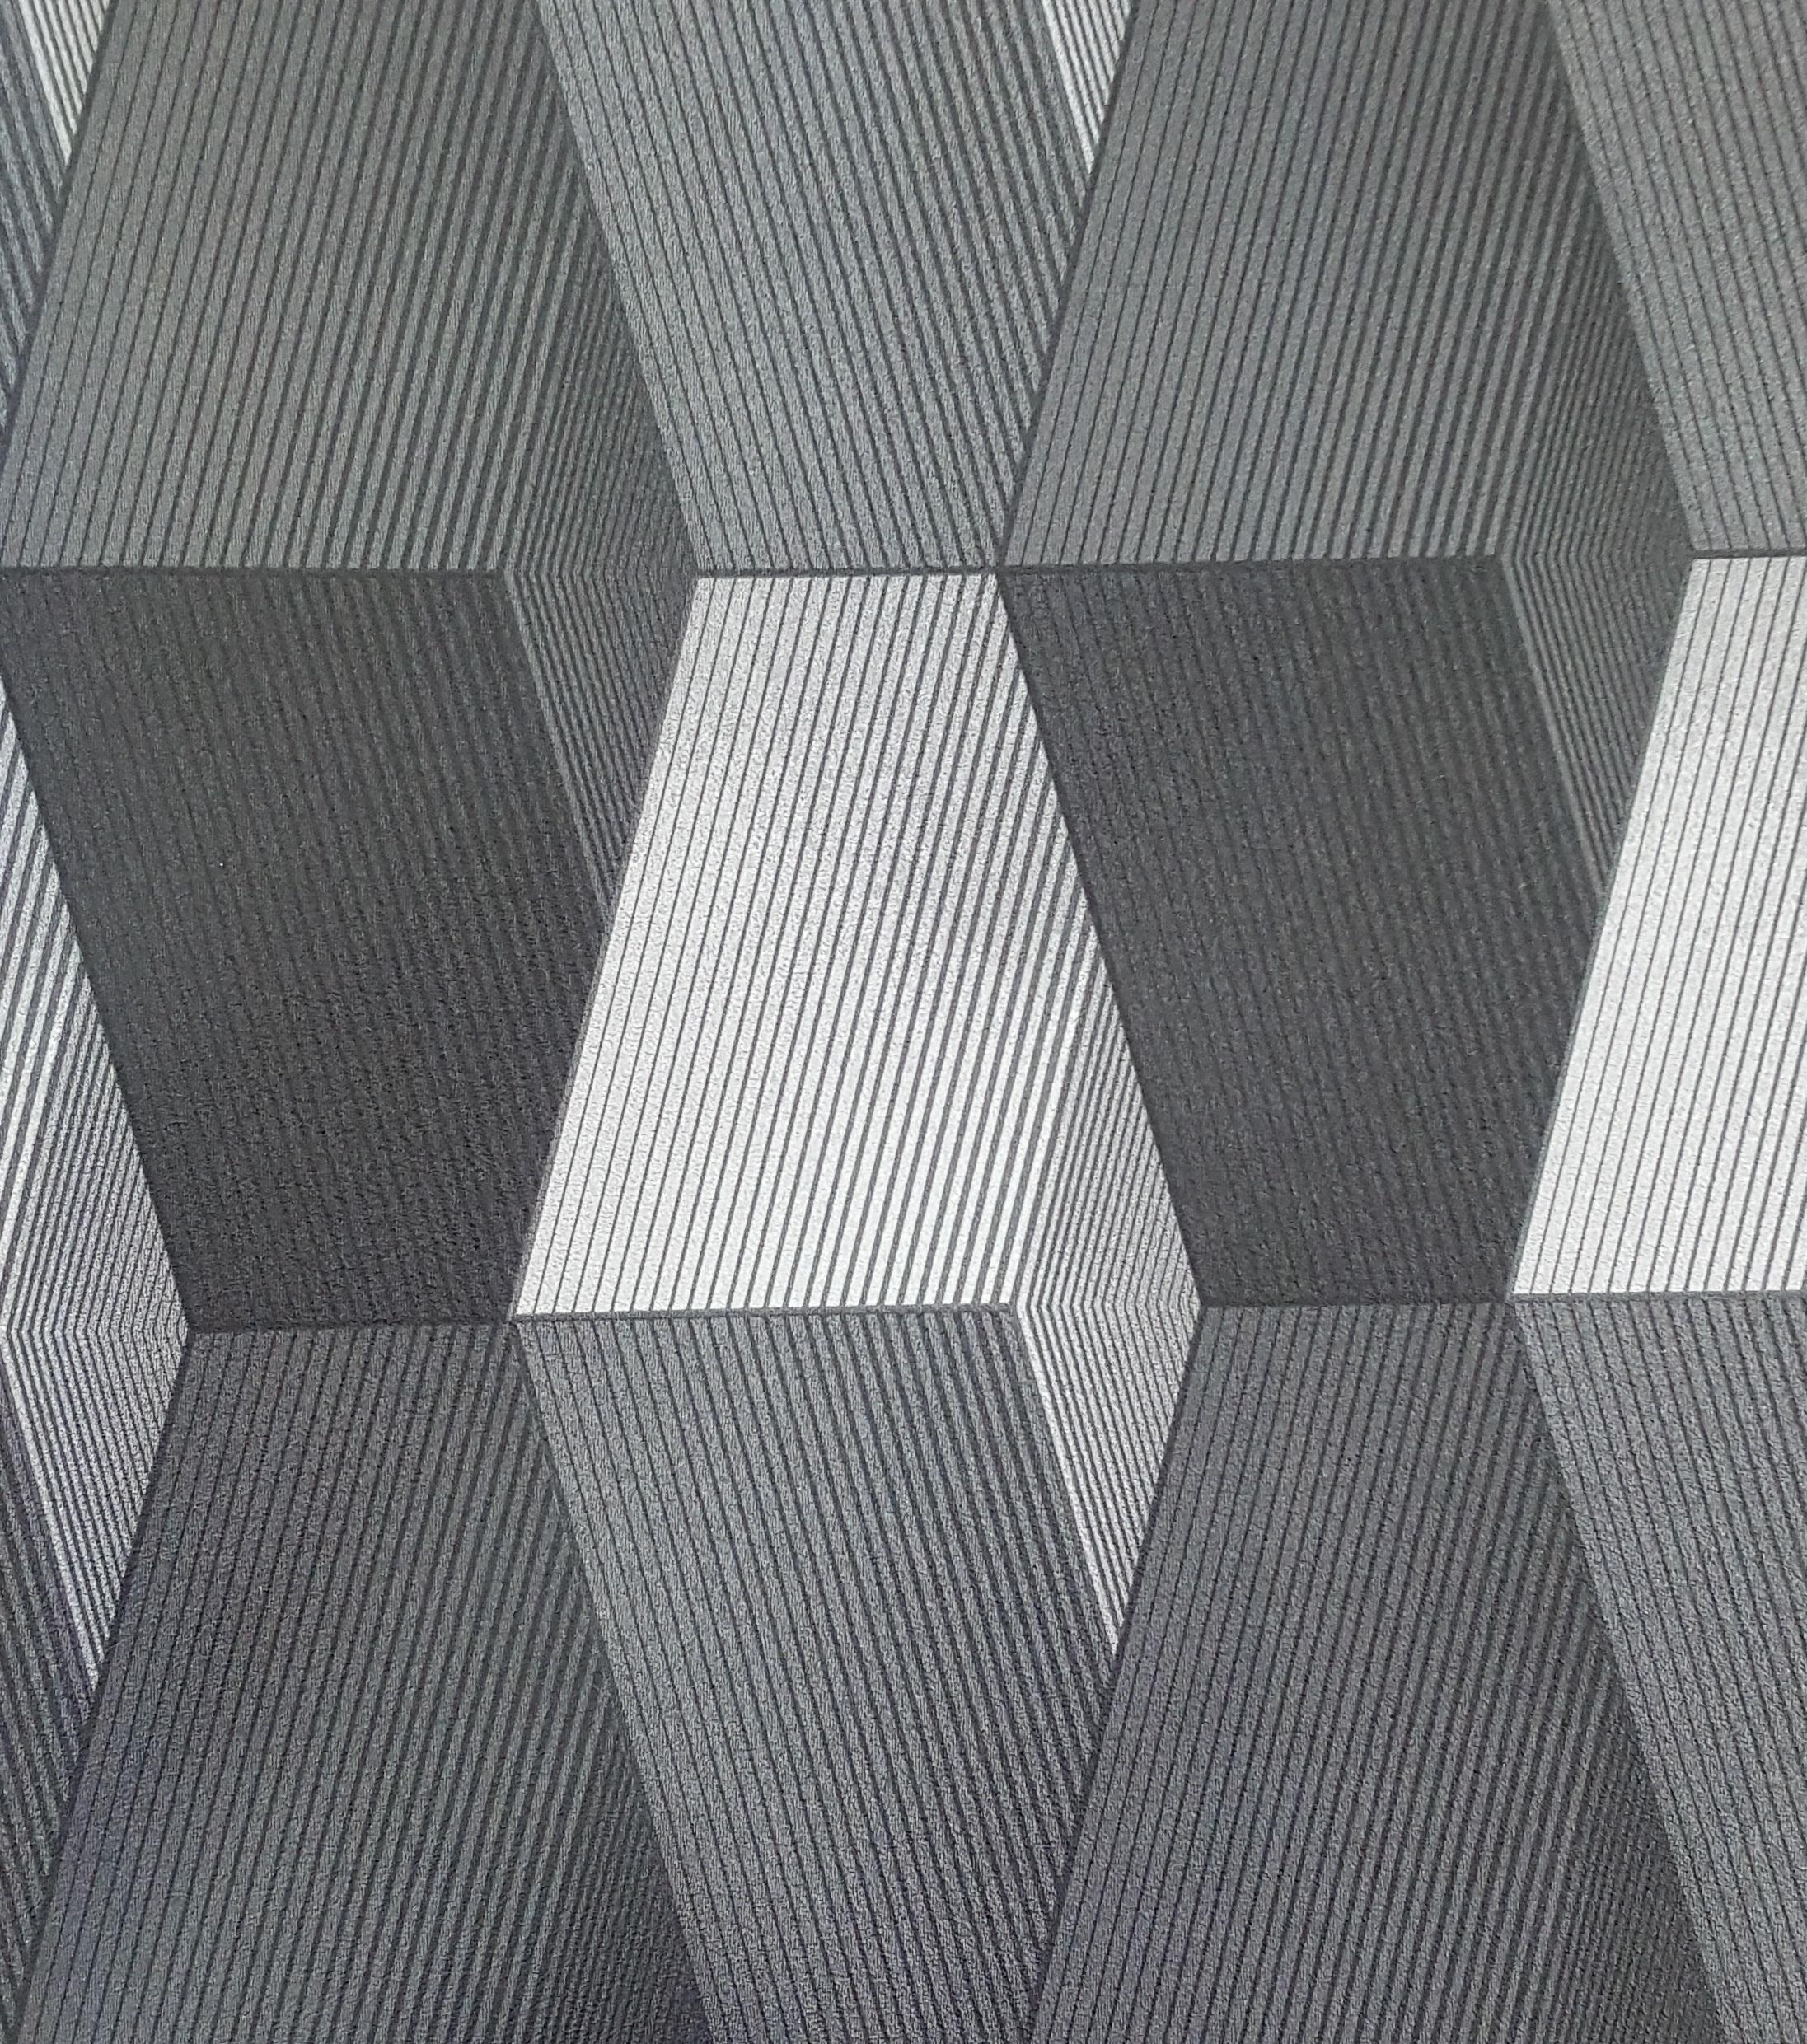 Light And Dark Grey Modern 3d Patterned Wallpaper X156 3033